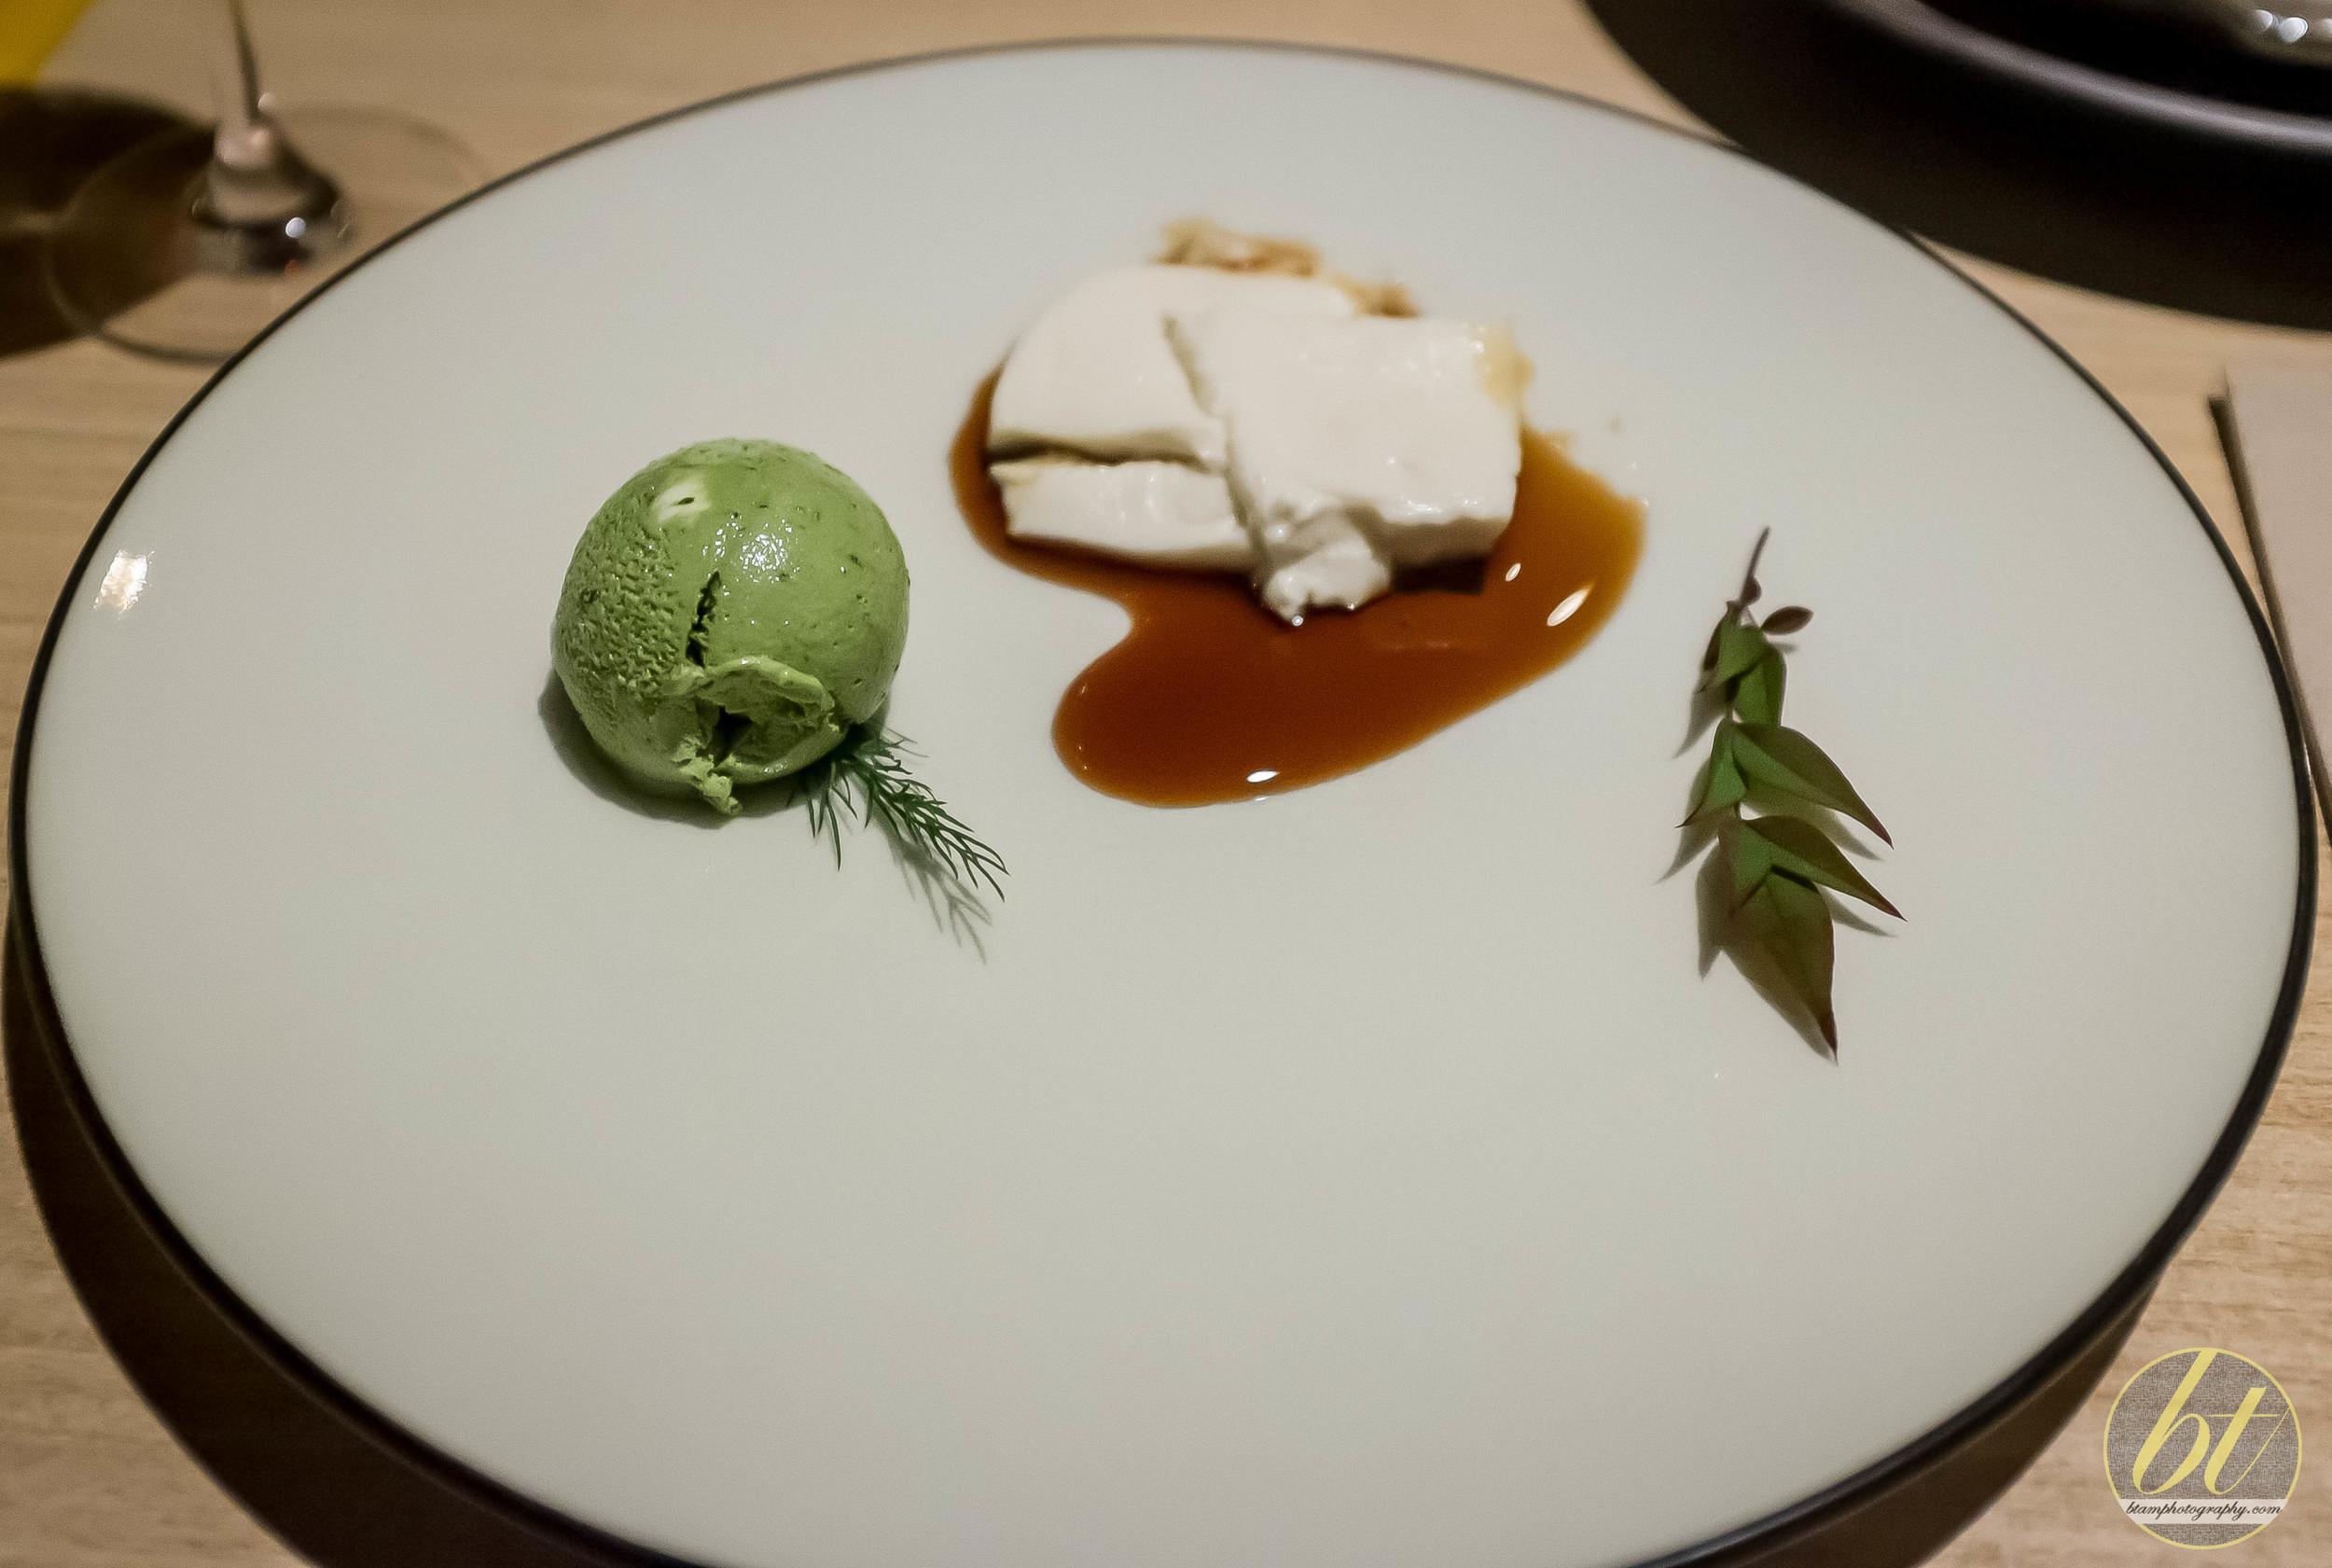 Sticky Mochi-mochi Tofu with Green Tea Ice Cream